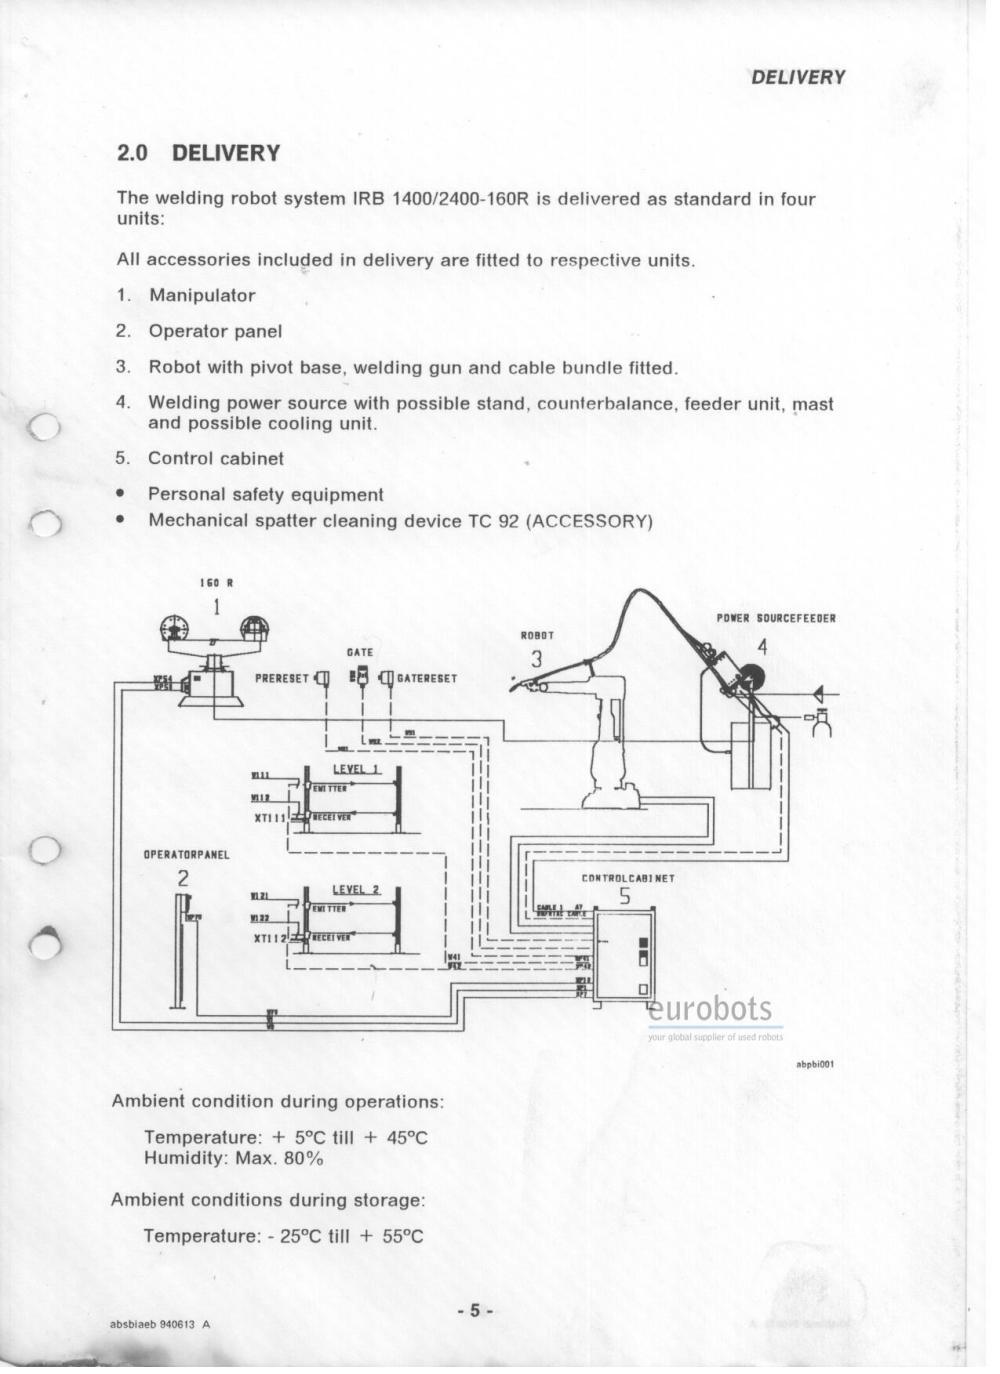 medium resolution of abb irc5 wiring diagram 23 wiring diagram images abb ats021 wiring diagram abb ats021 wiring diagram